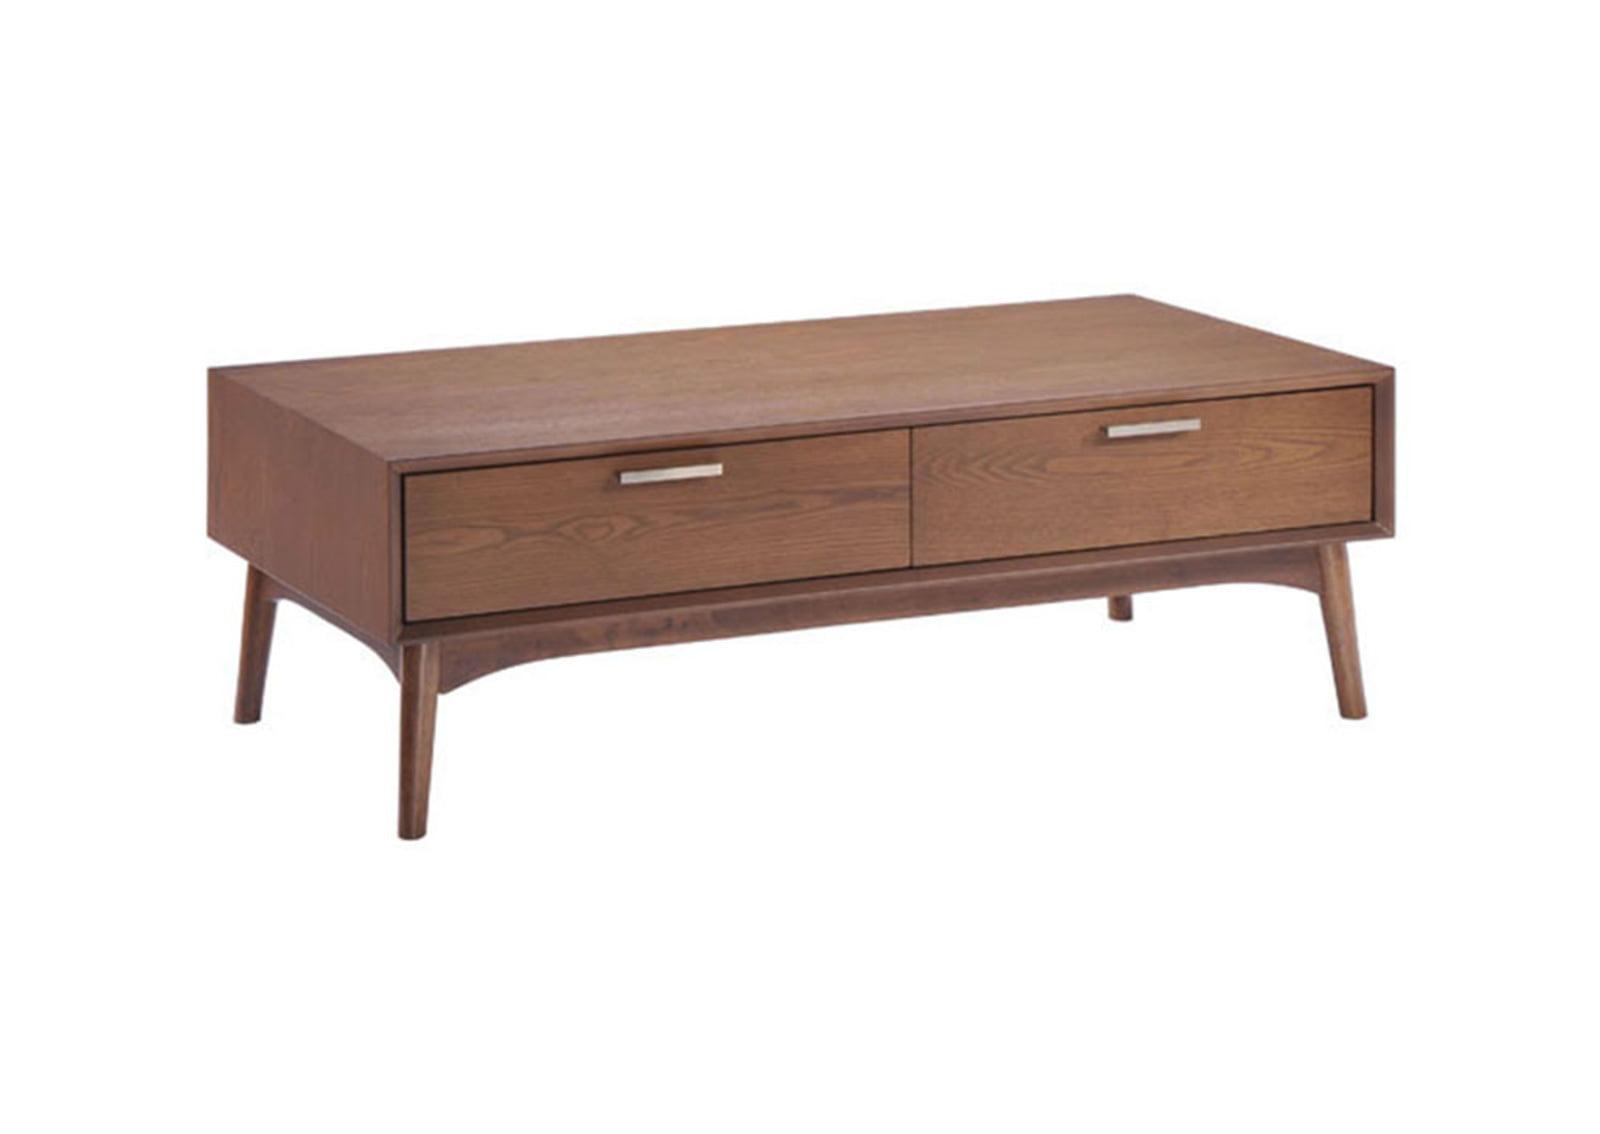 Design-District-Coffee-Table-Walnut1